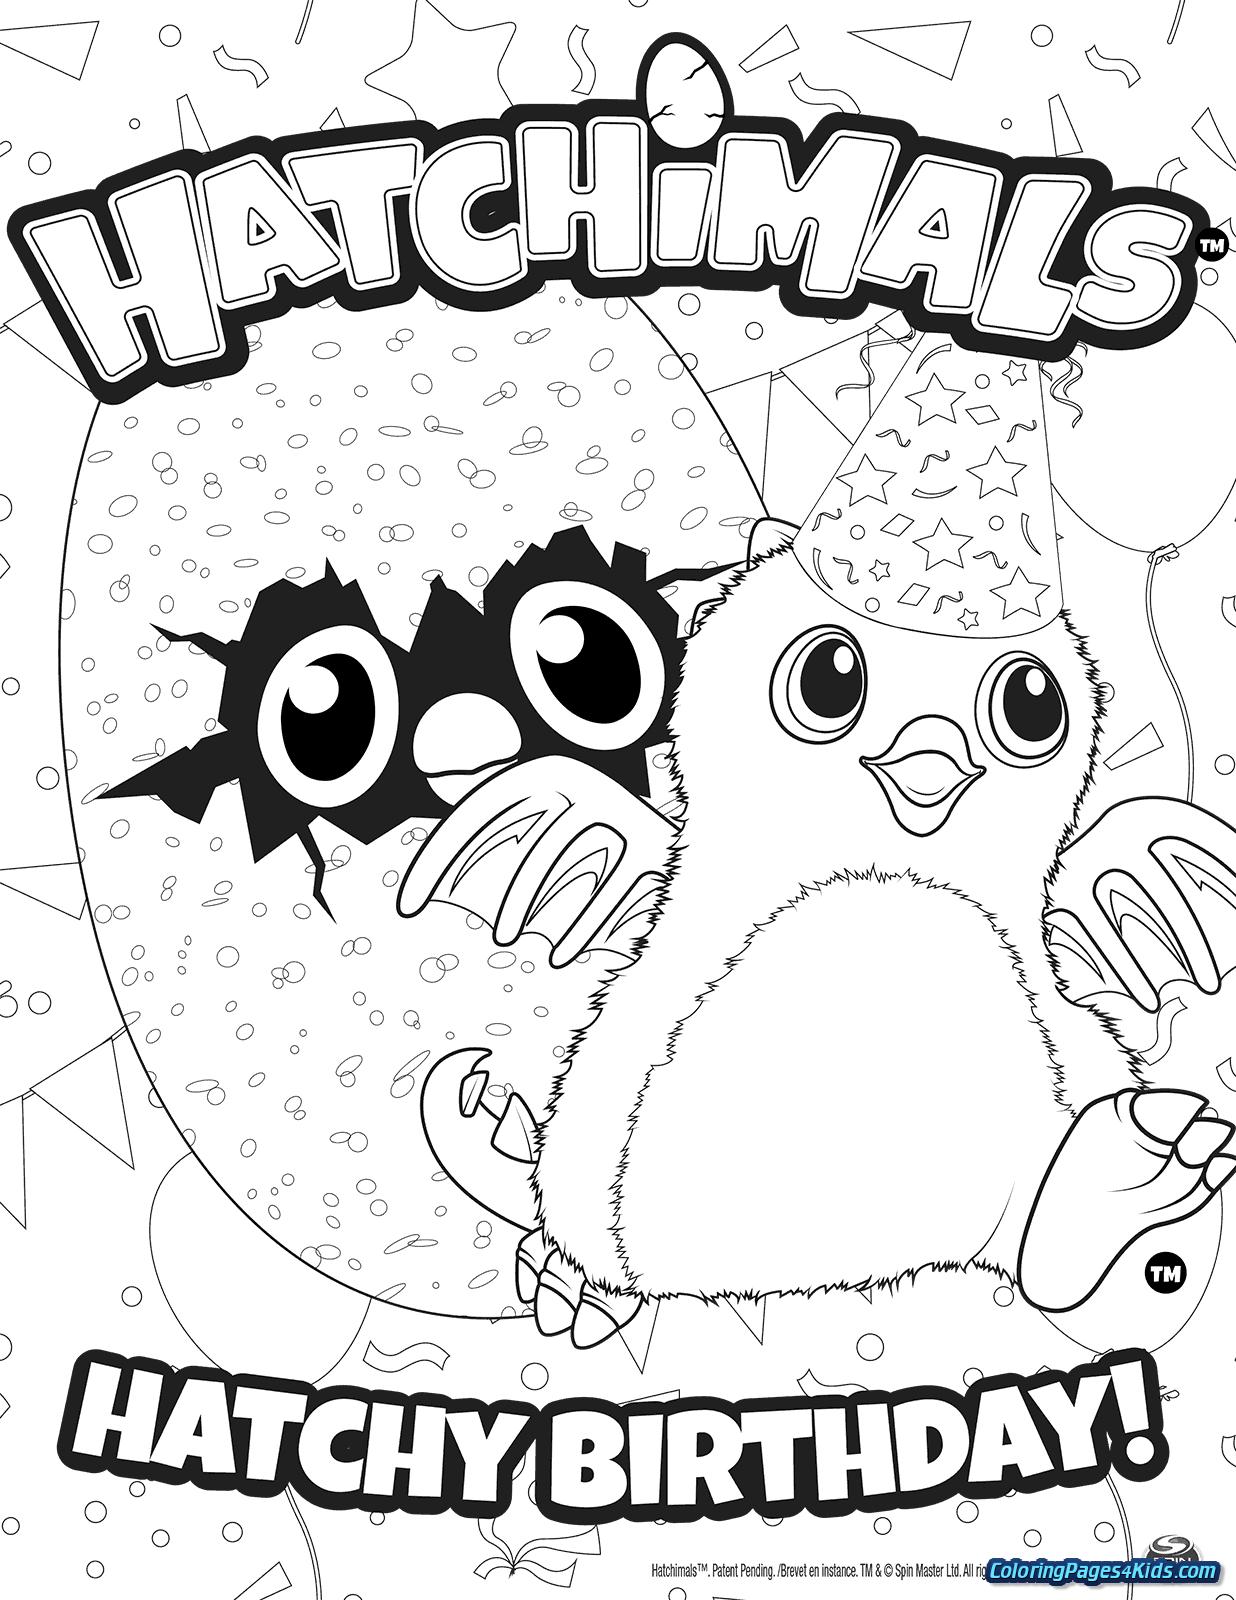 Hatchimals Coloring Pages - Coloring Pages For Kids à Coloriage Happy Color